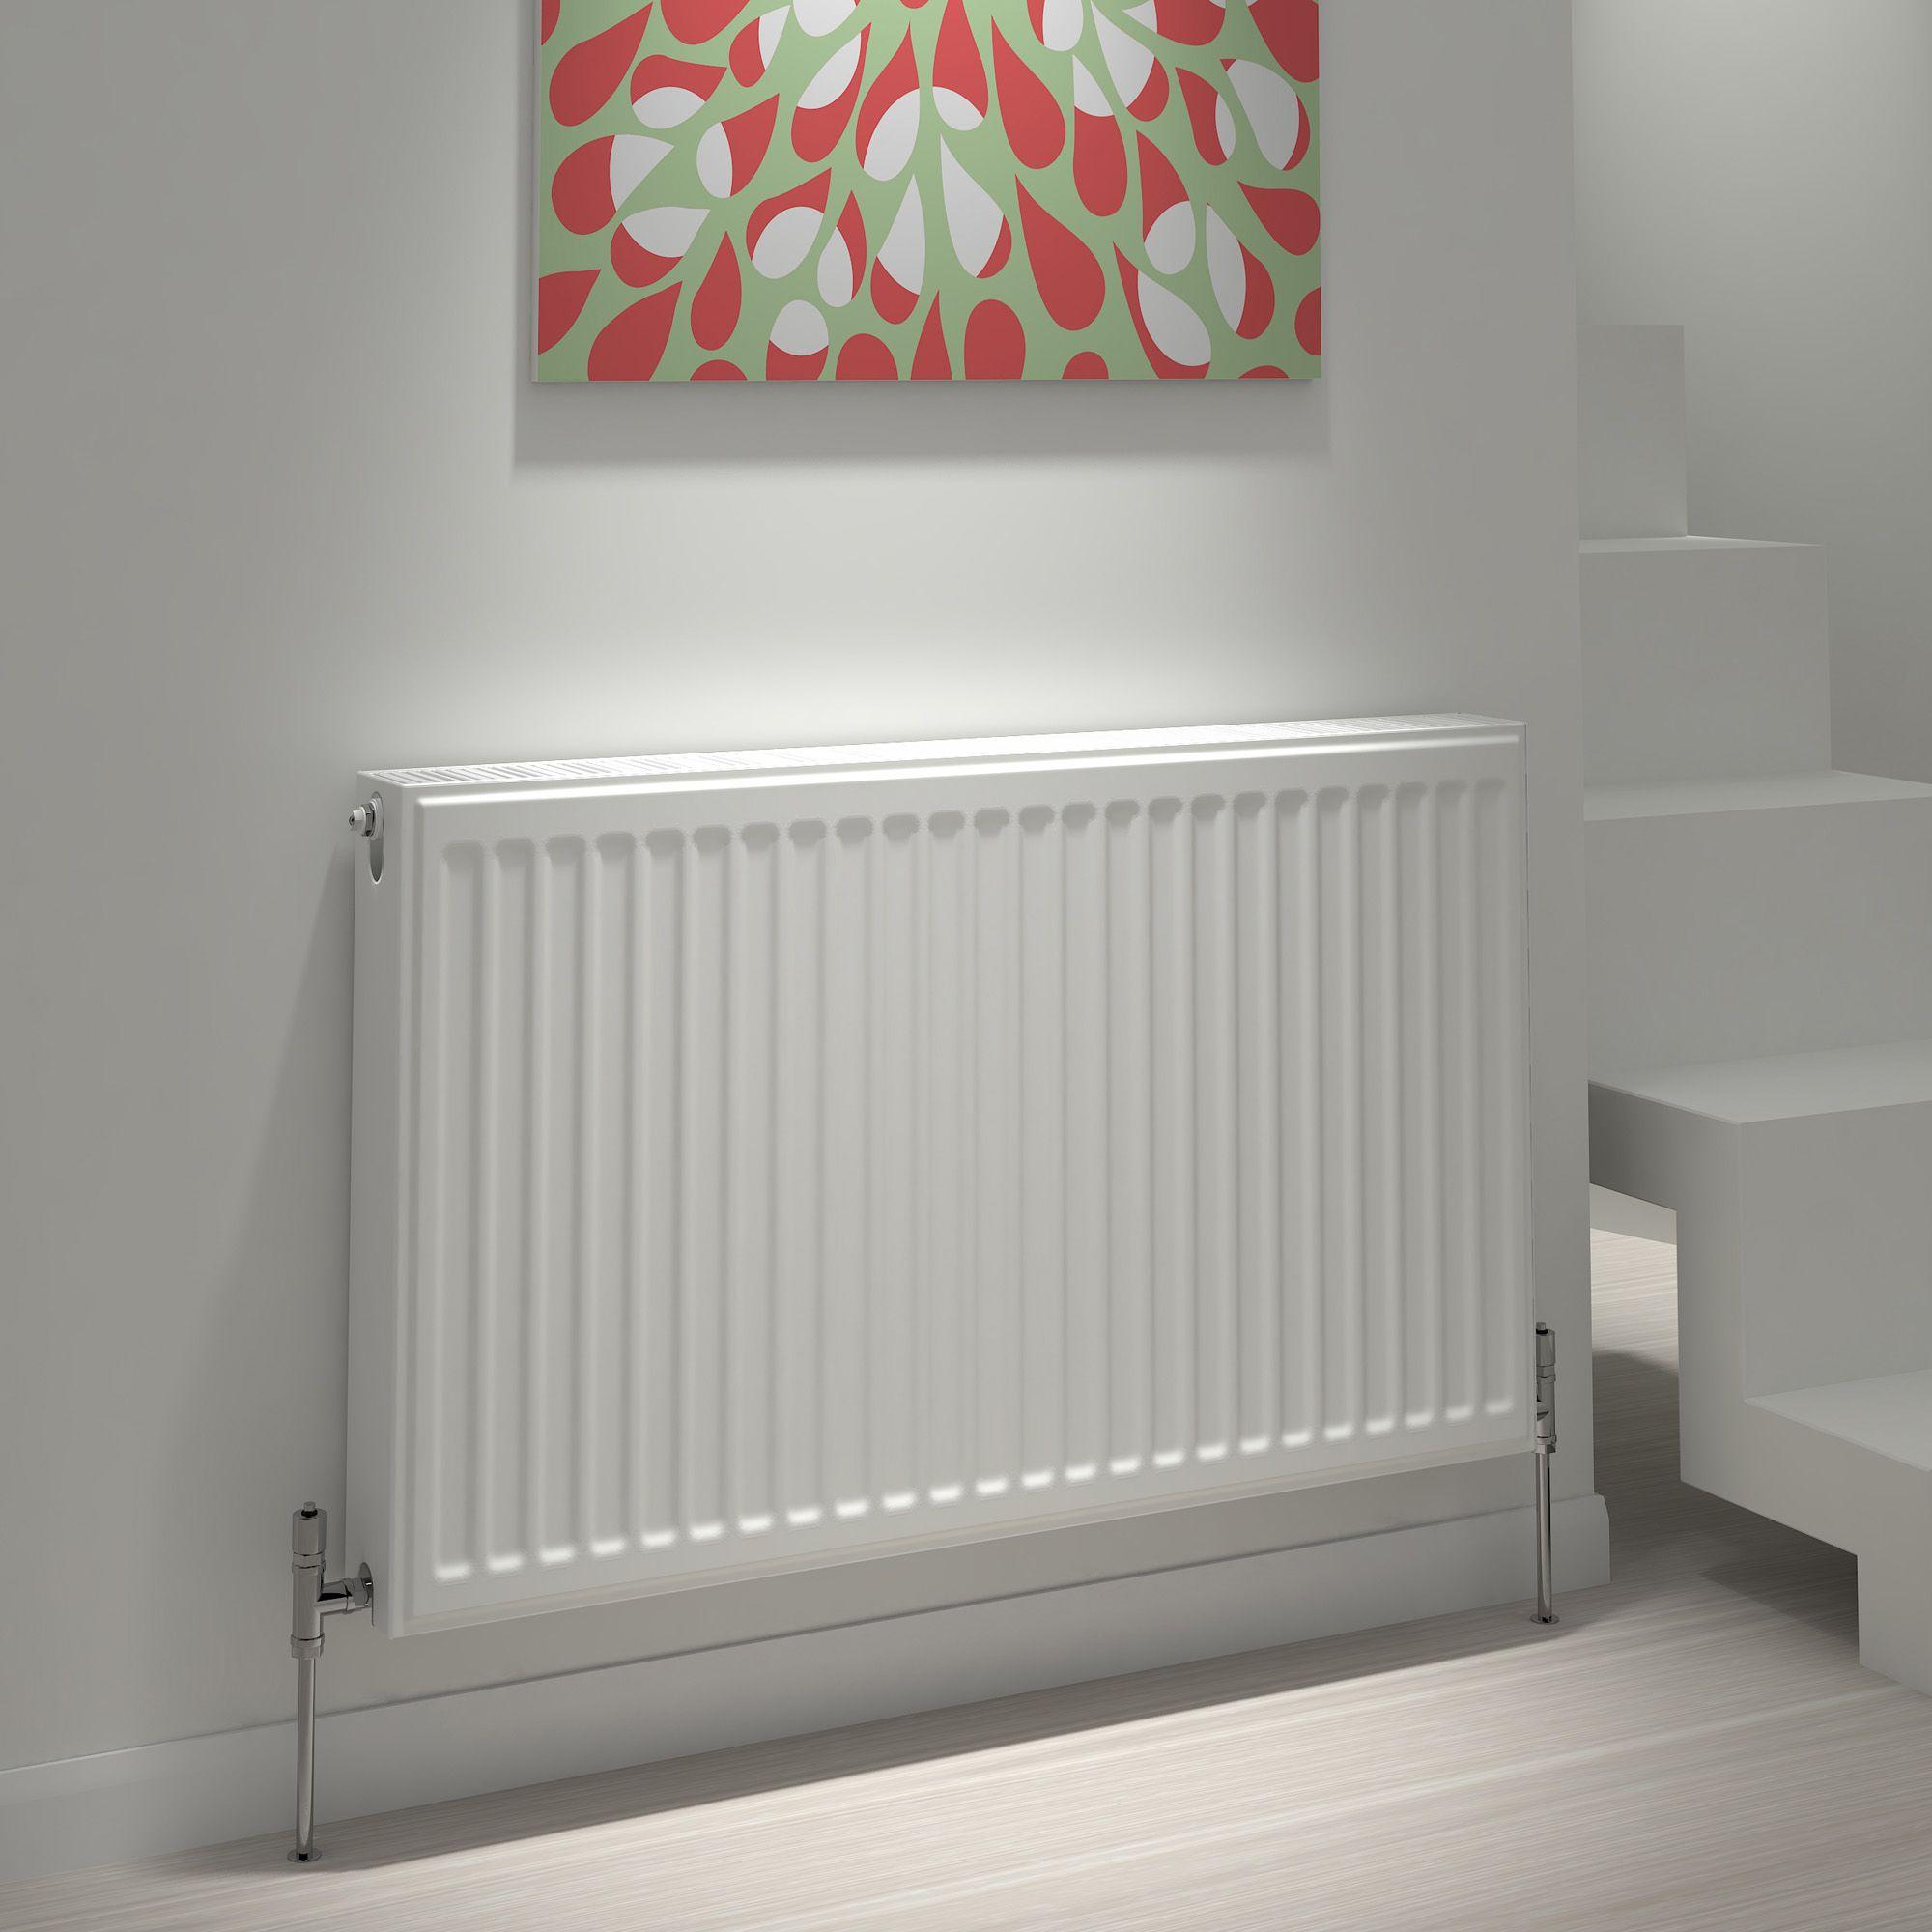 Kudox Type 11 single Panel radiator White, (H)400mm